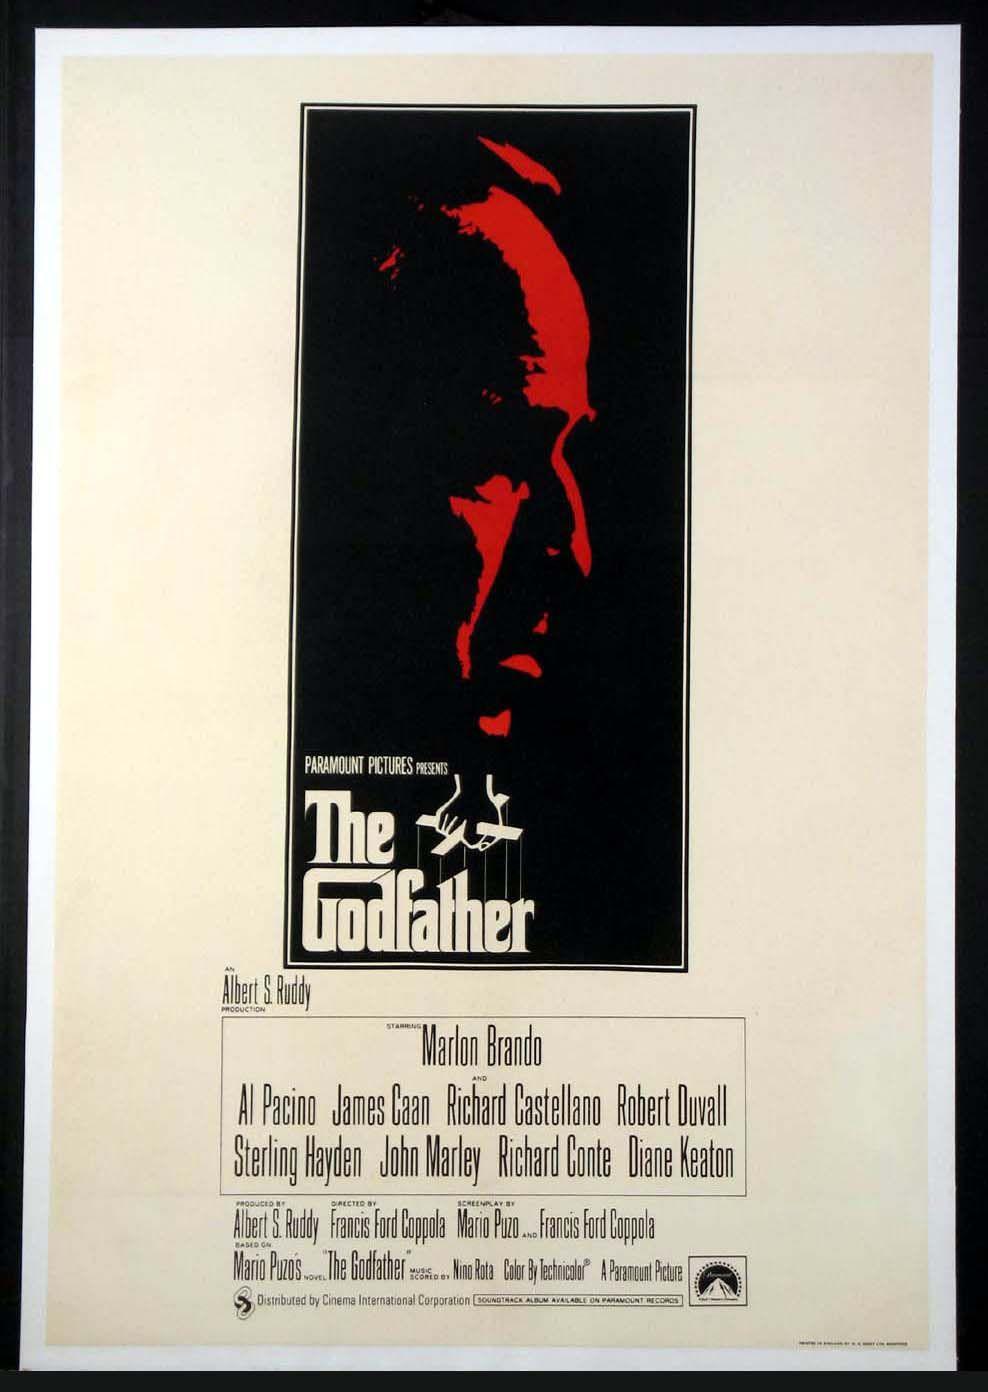 The Godfather 1972 Original British One Sheet Size 27x40 Movie Poster The Godfather Poster The Godfather Godfather Movie